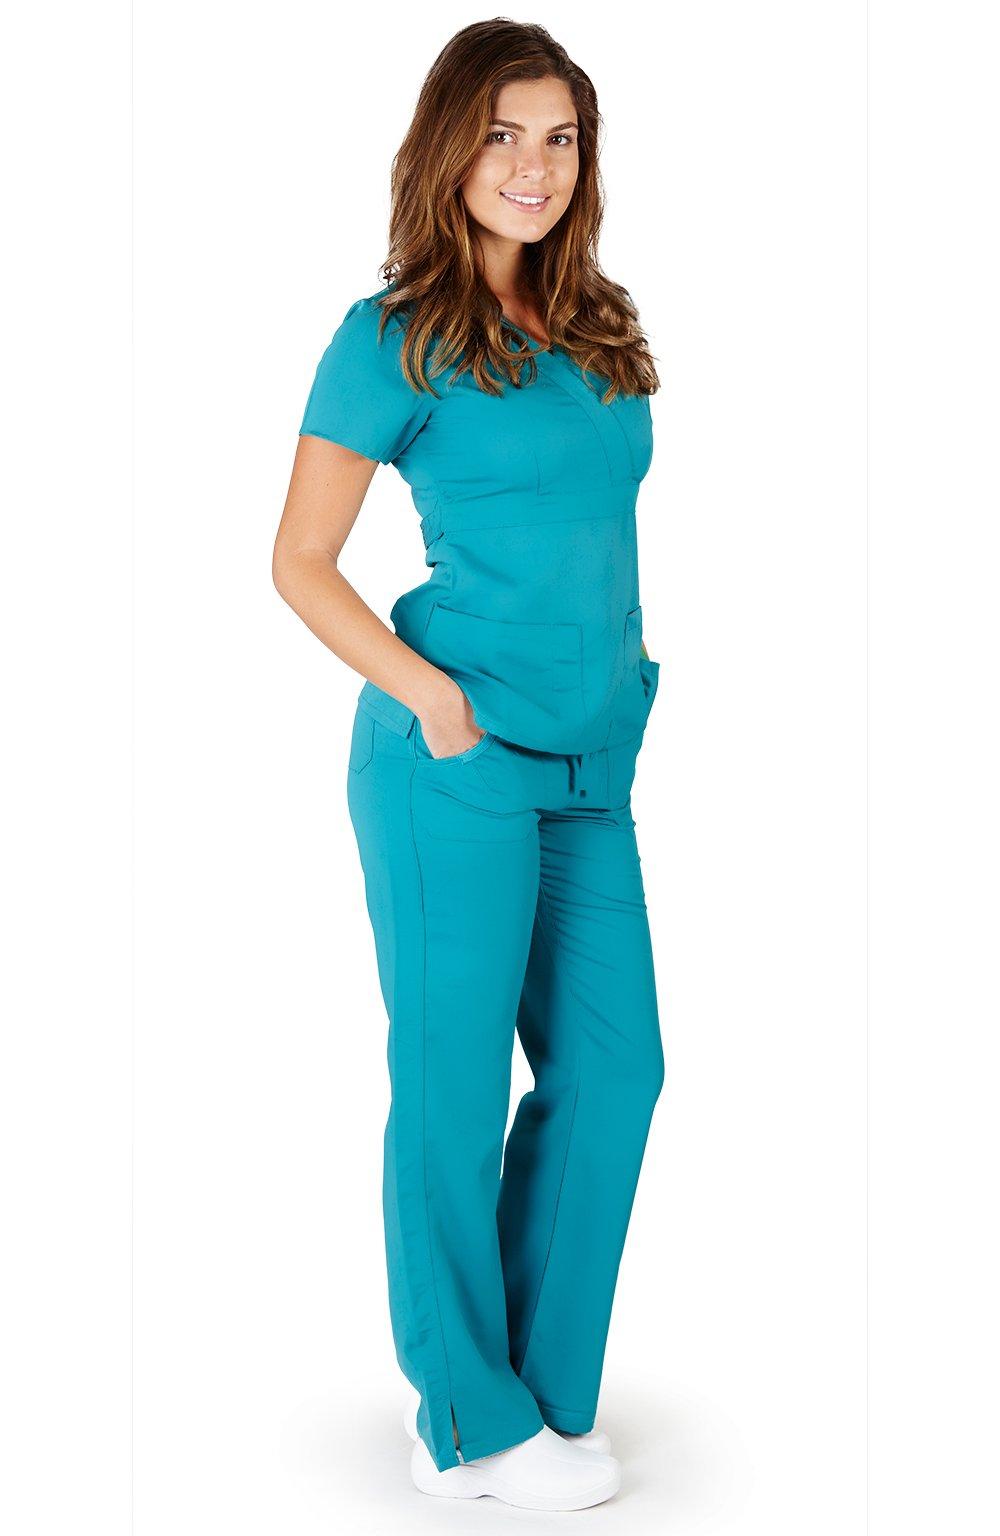 Ultra Soft Brand Scrubs - Premium Womens Junior Fit 3 Pocket Mock Wrap Scrub Set, Teal 39114-X-Large